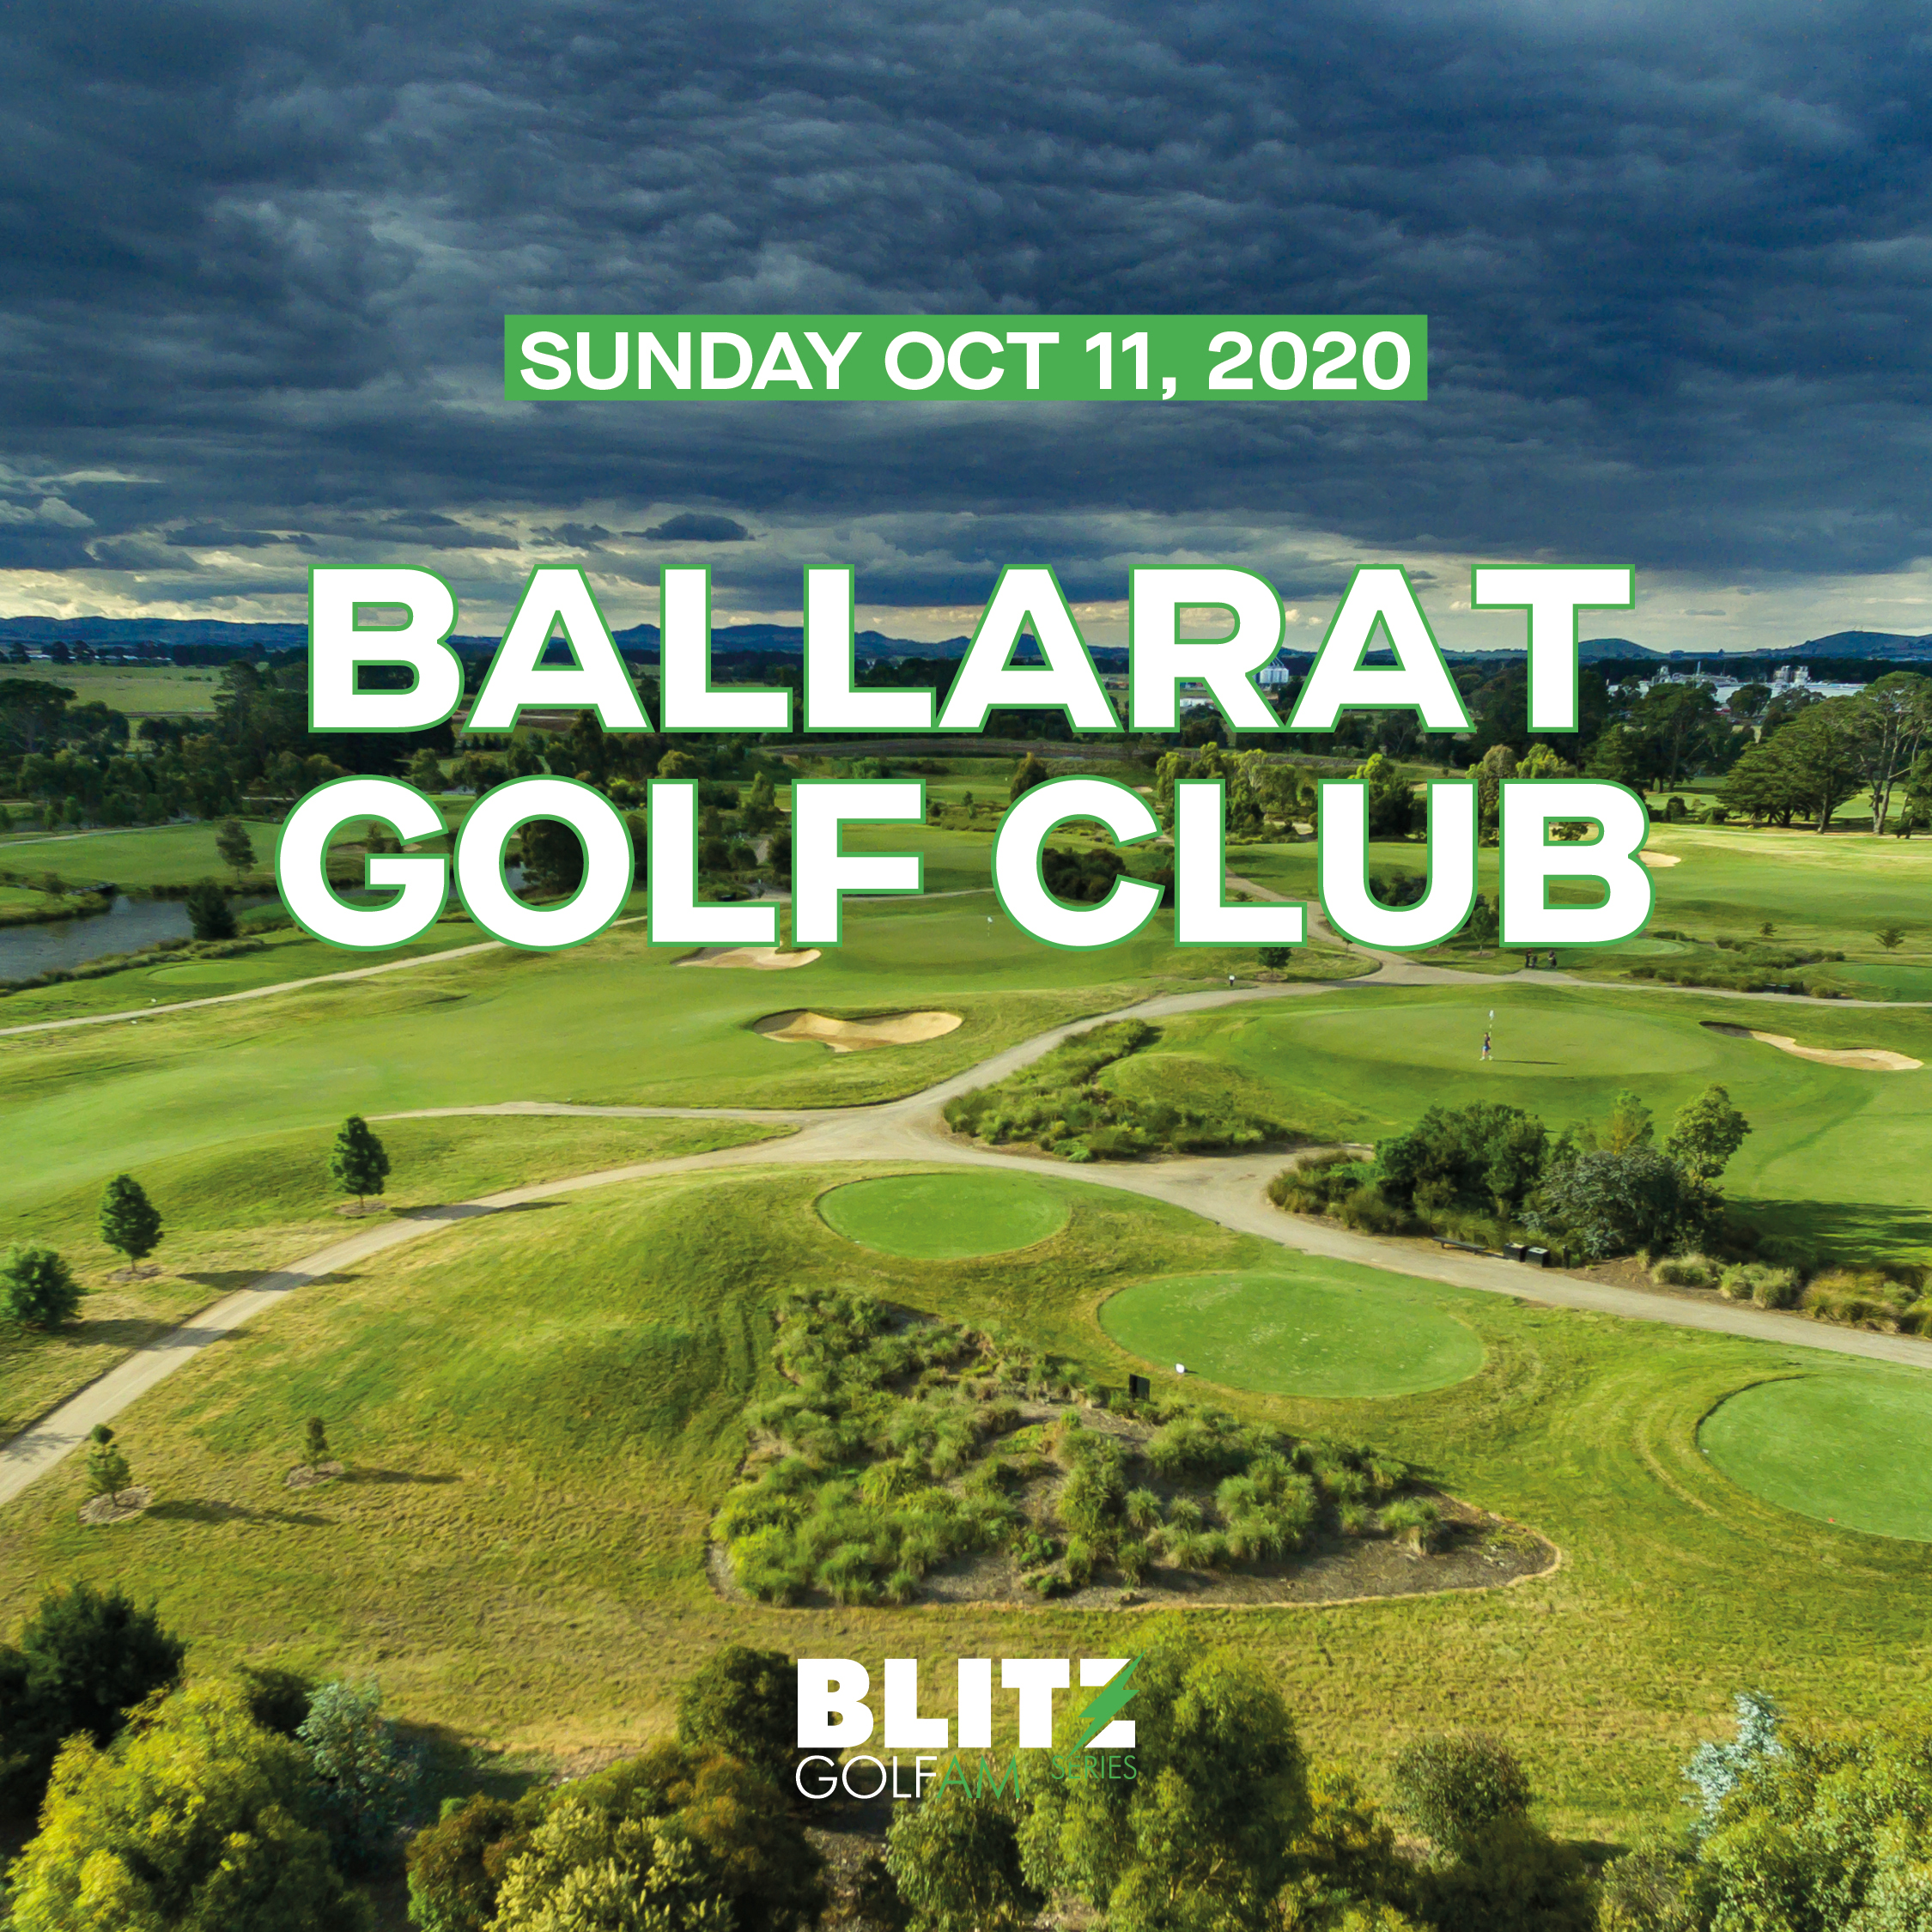 VICTAS_Ballarat_Blitz 2020_AM Series Launch_111020.jpg